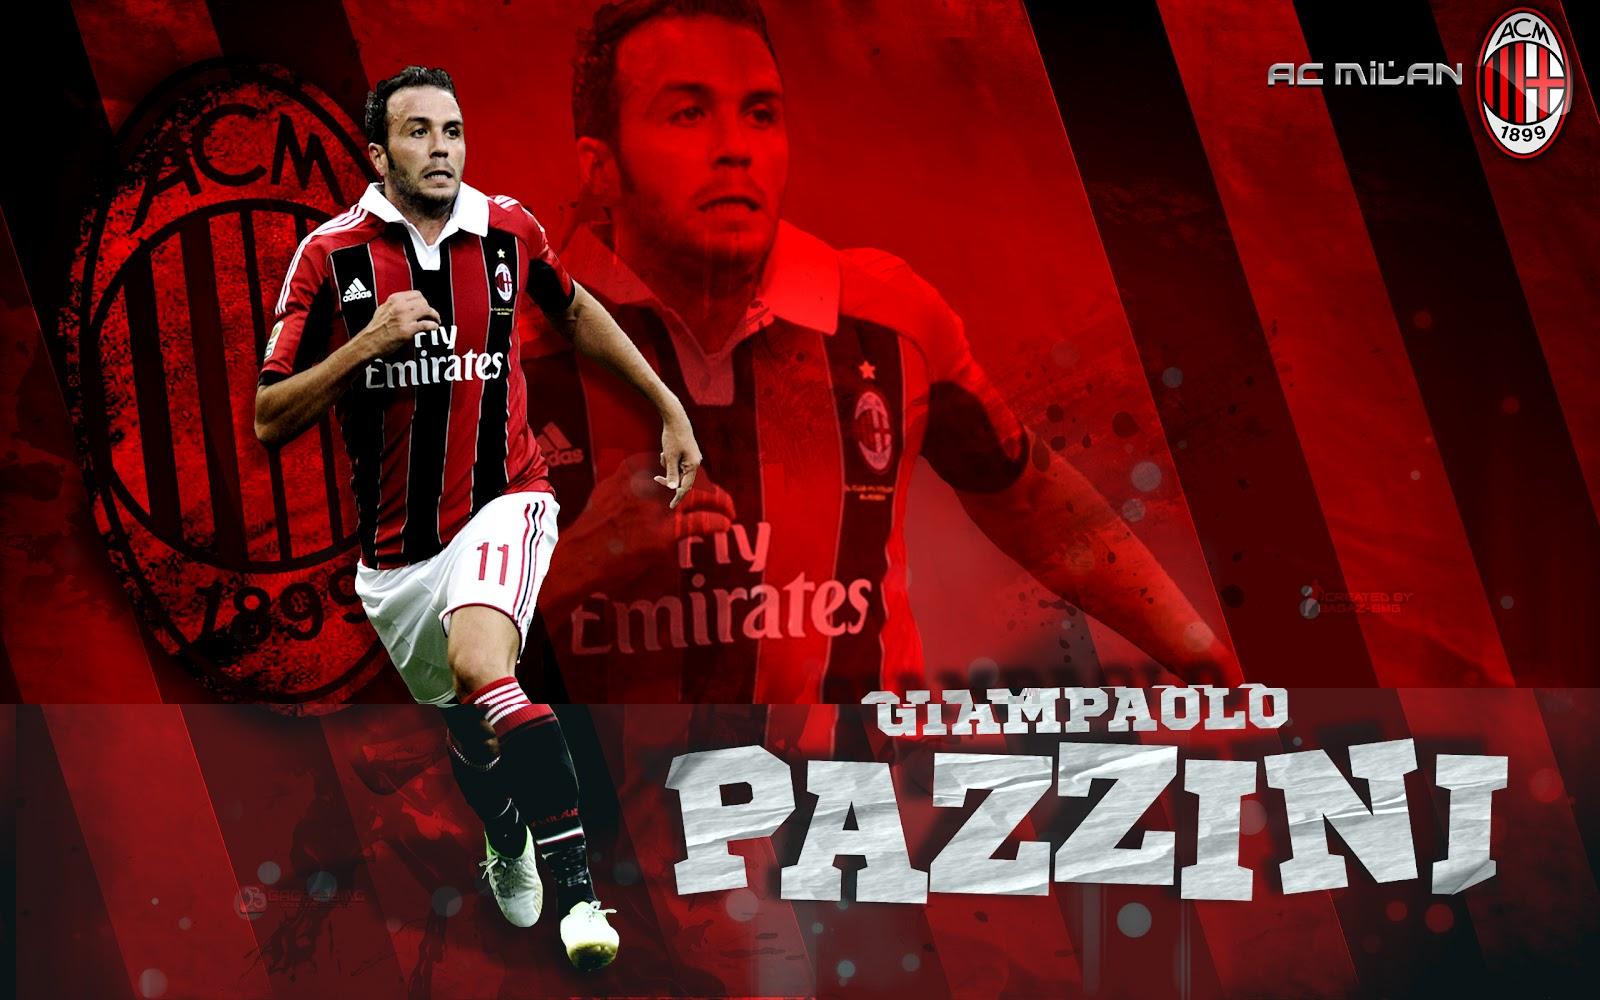 http://2.bp.blogspot.com/-XdOPv-4QWhU/UN-j5mheL0I/AAAAAAAAOBE/JR_24PU78cY/s1600/AC+Milan+2013+Wallpapers+HD+Pazzini.jpg